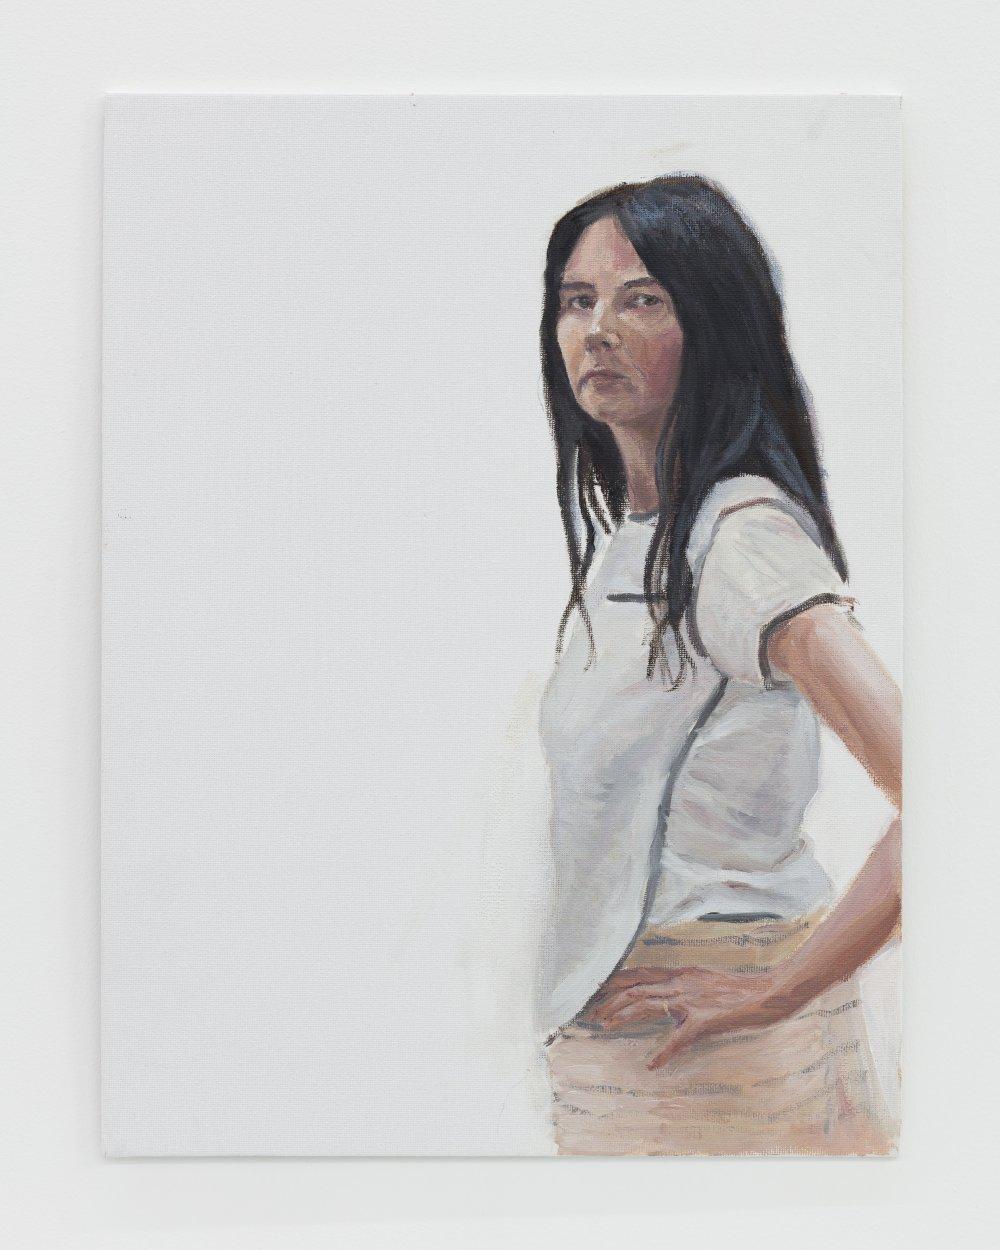 Untitled (lockdown portrait)